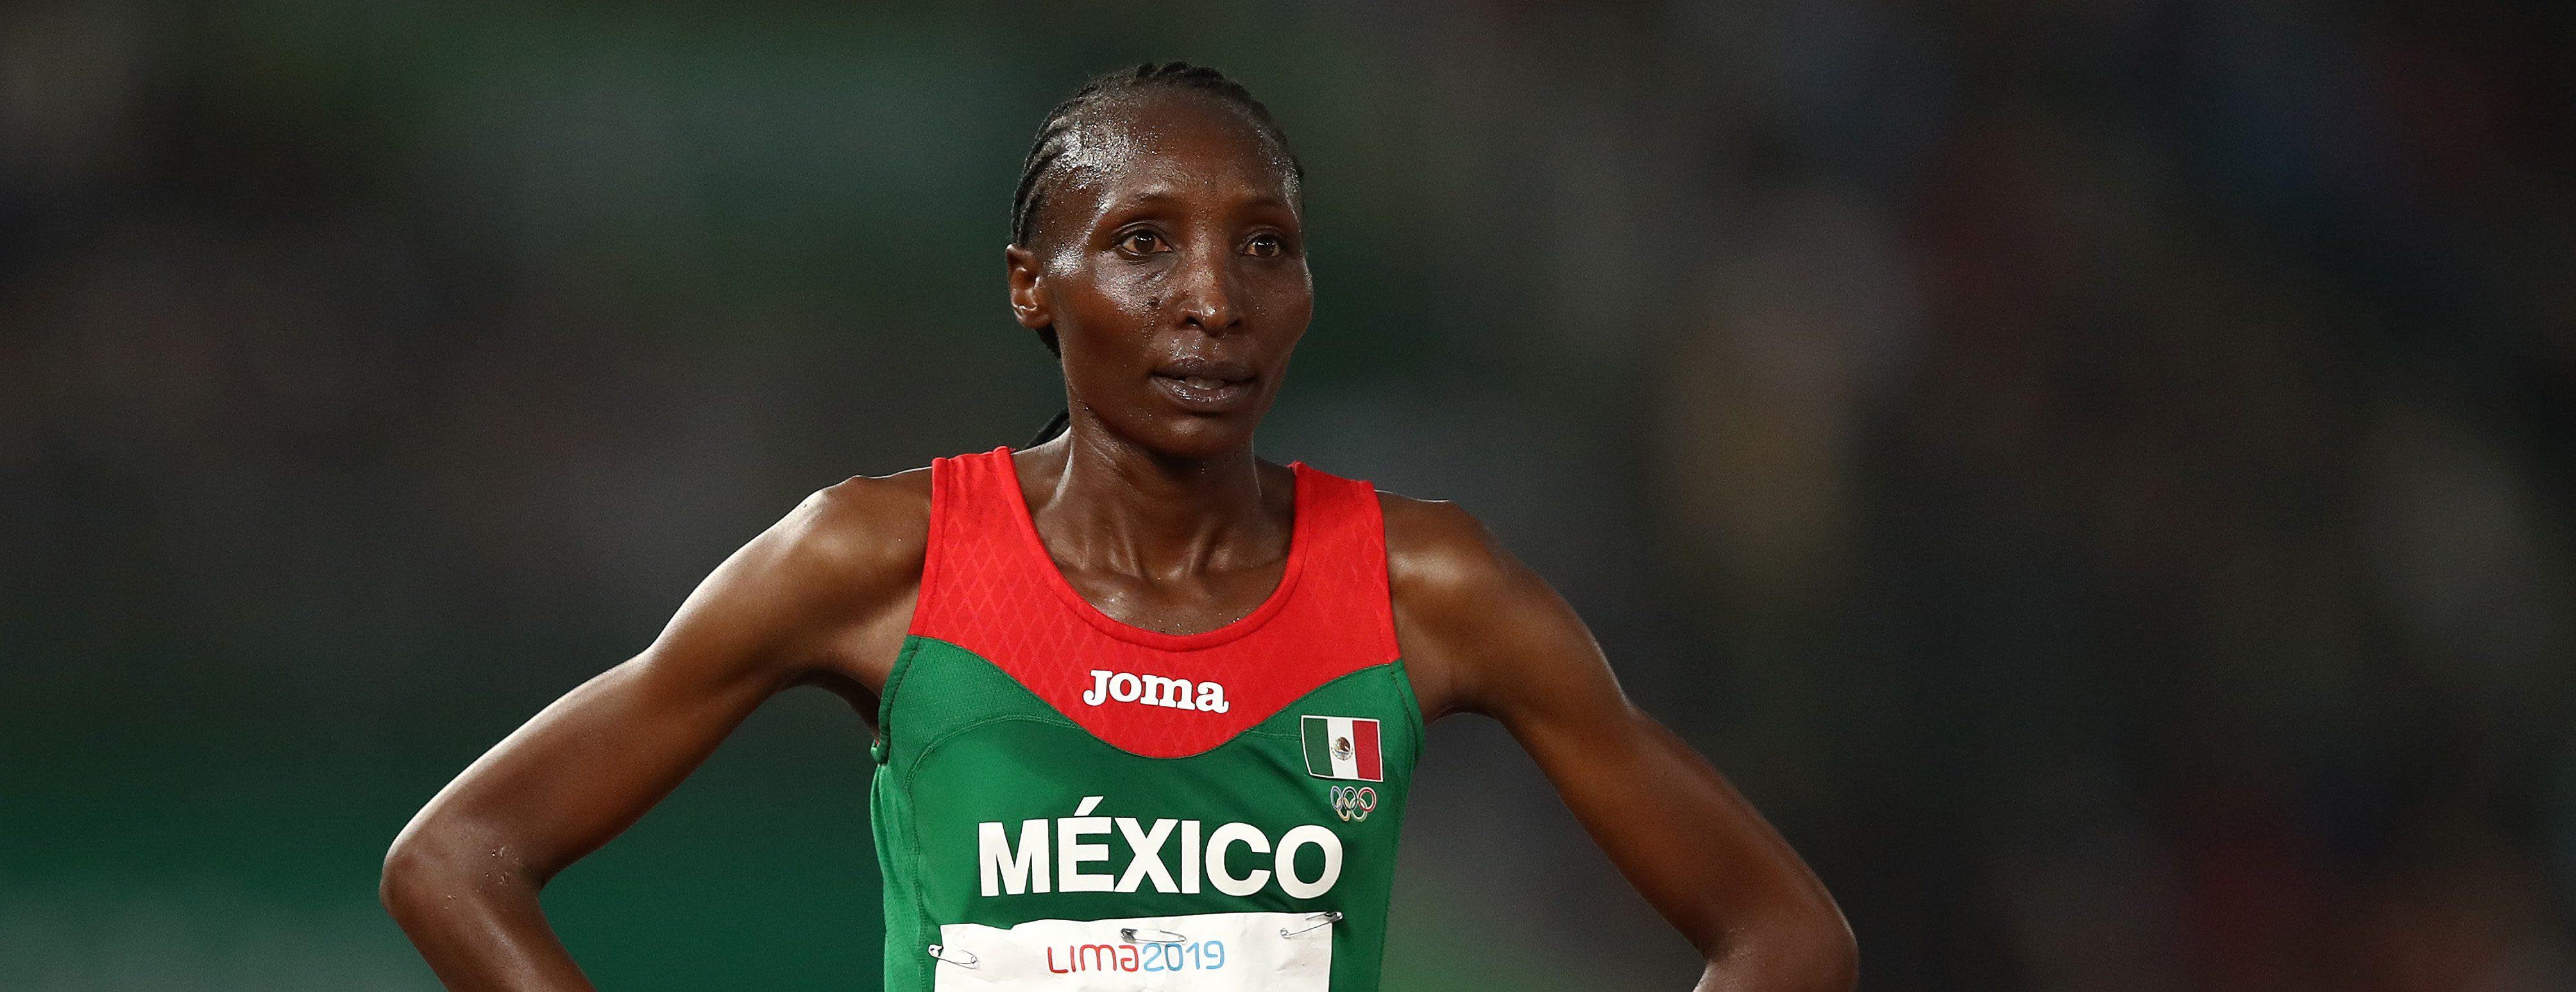 Meet Risper Biyaki Gesabwa, the Kenya-Born Racer Who Repped Mexico at Pan American Games